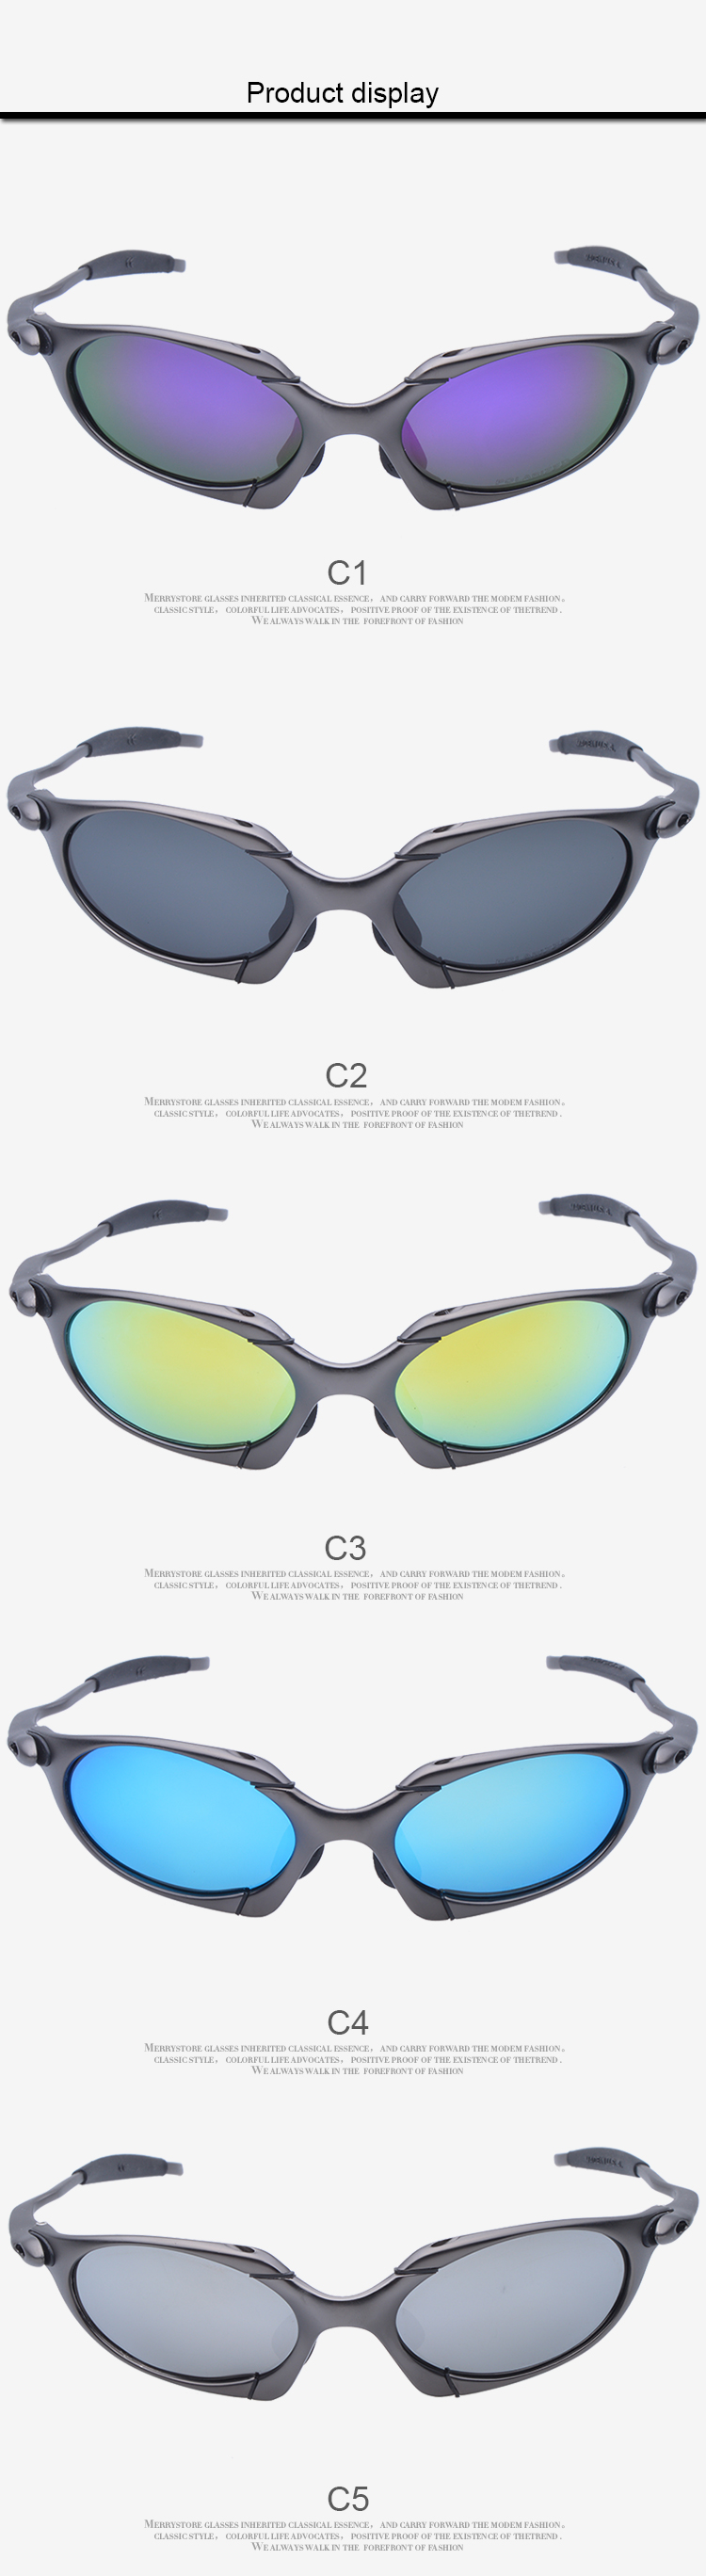 CP002-4_05